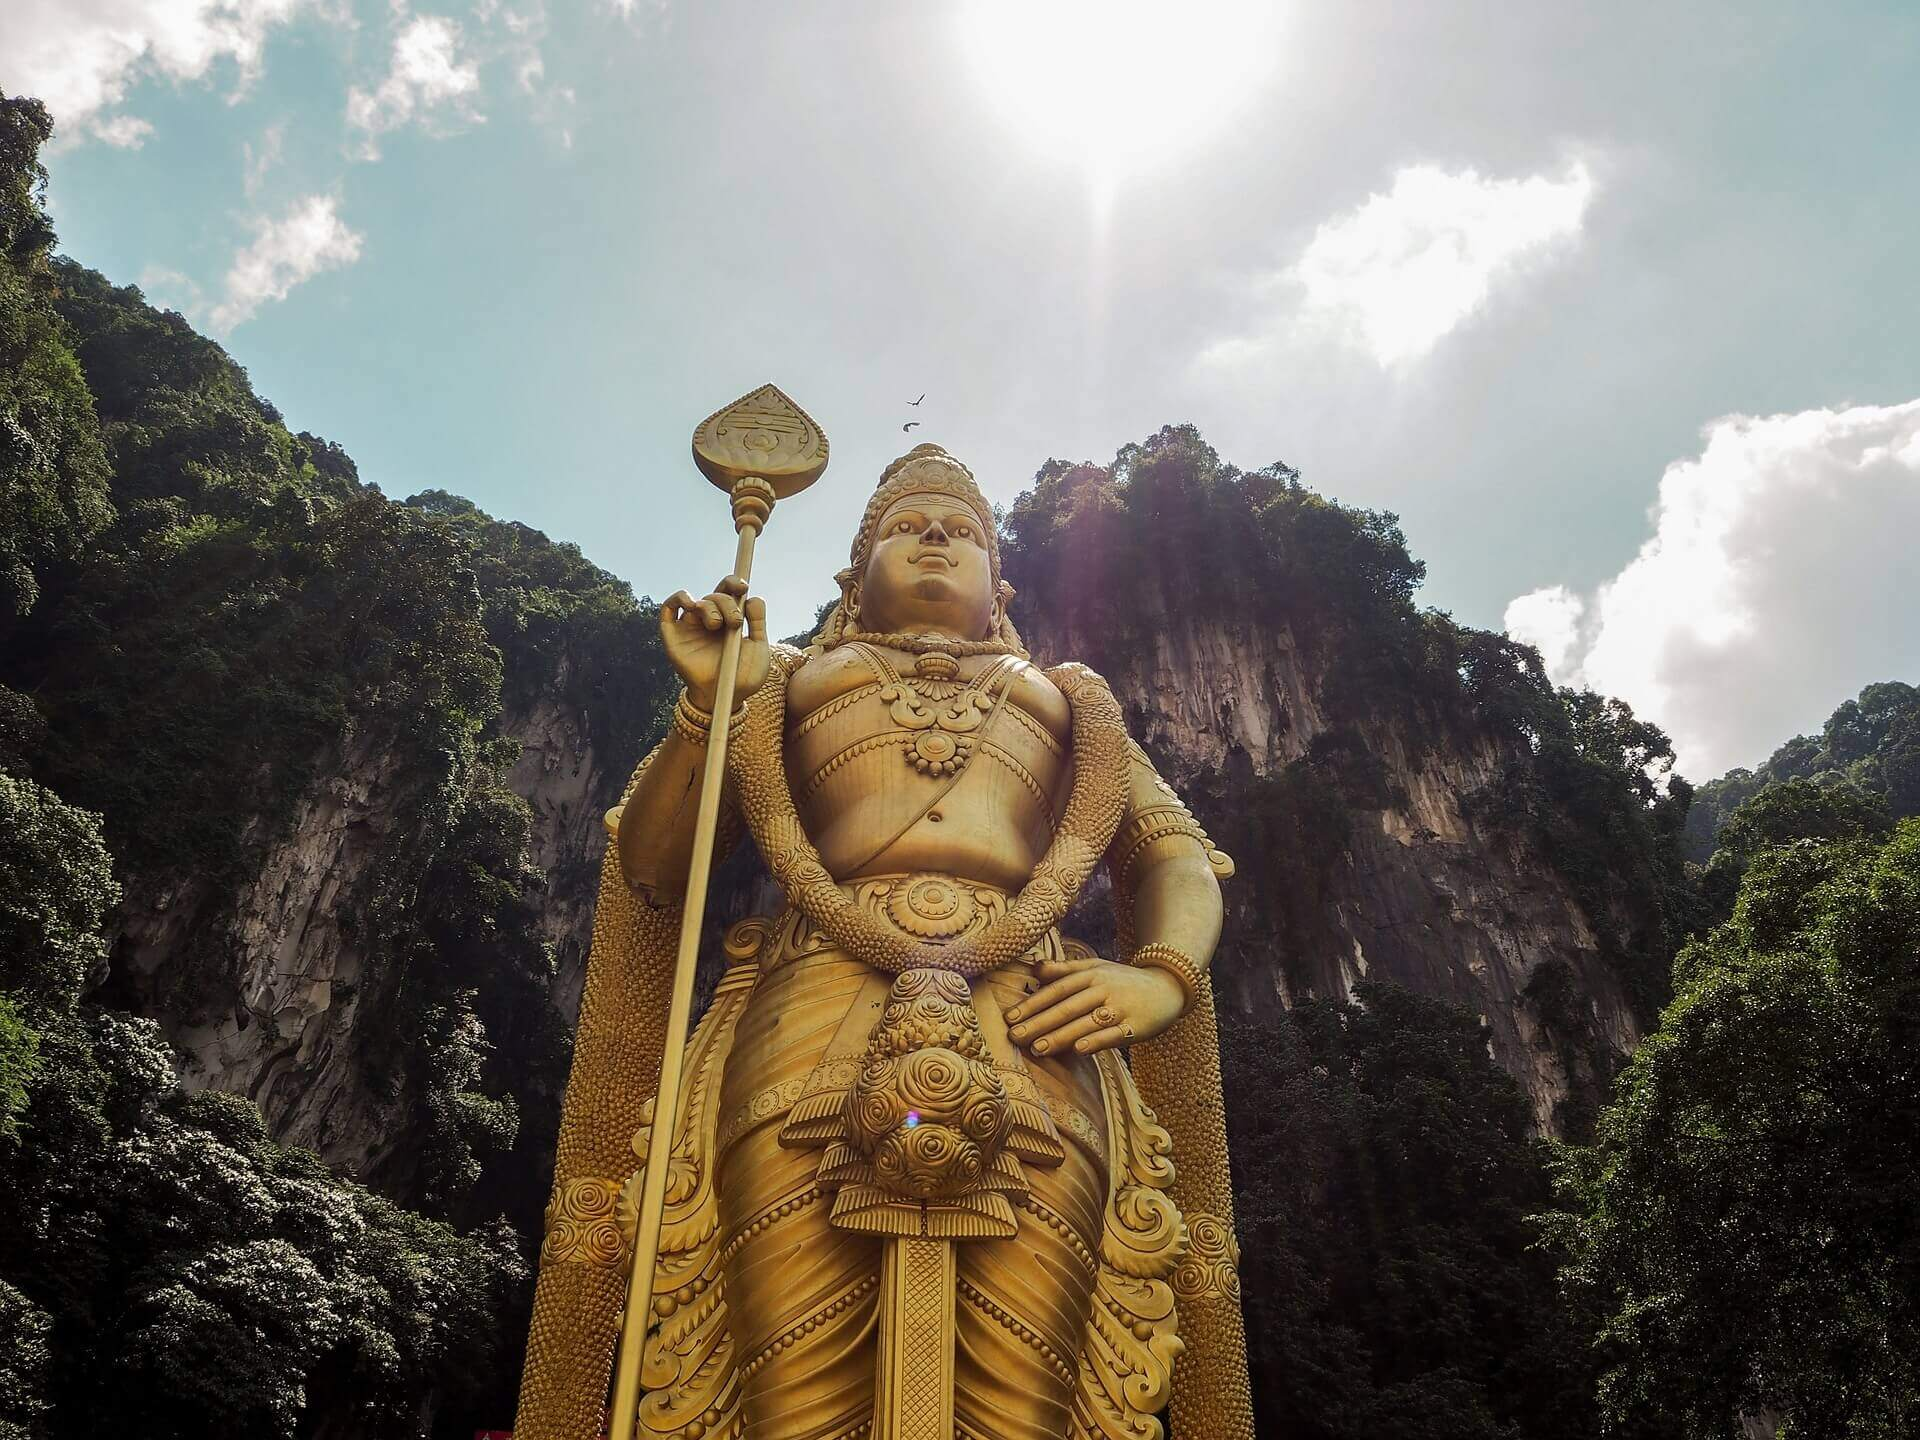 Bezienswaardigheden_Kuala_Lumpur_Batu_caves